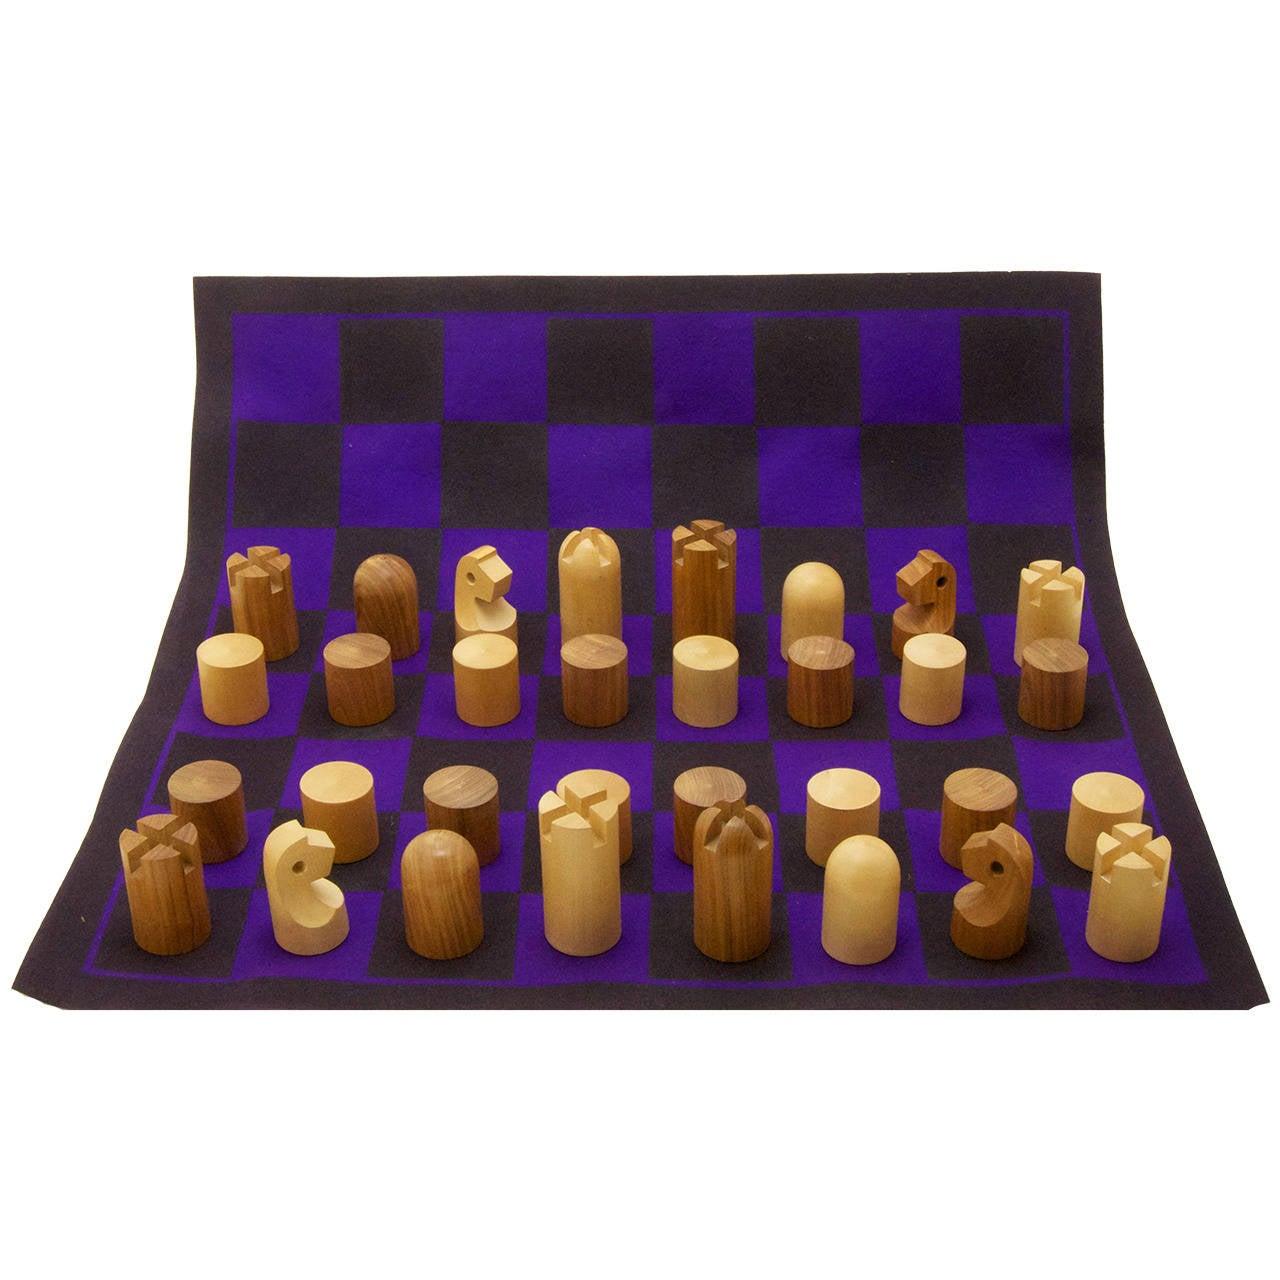 Minimalist Chess Set by Carl Auböck